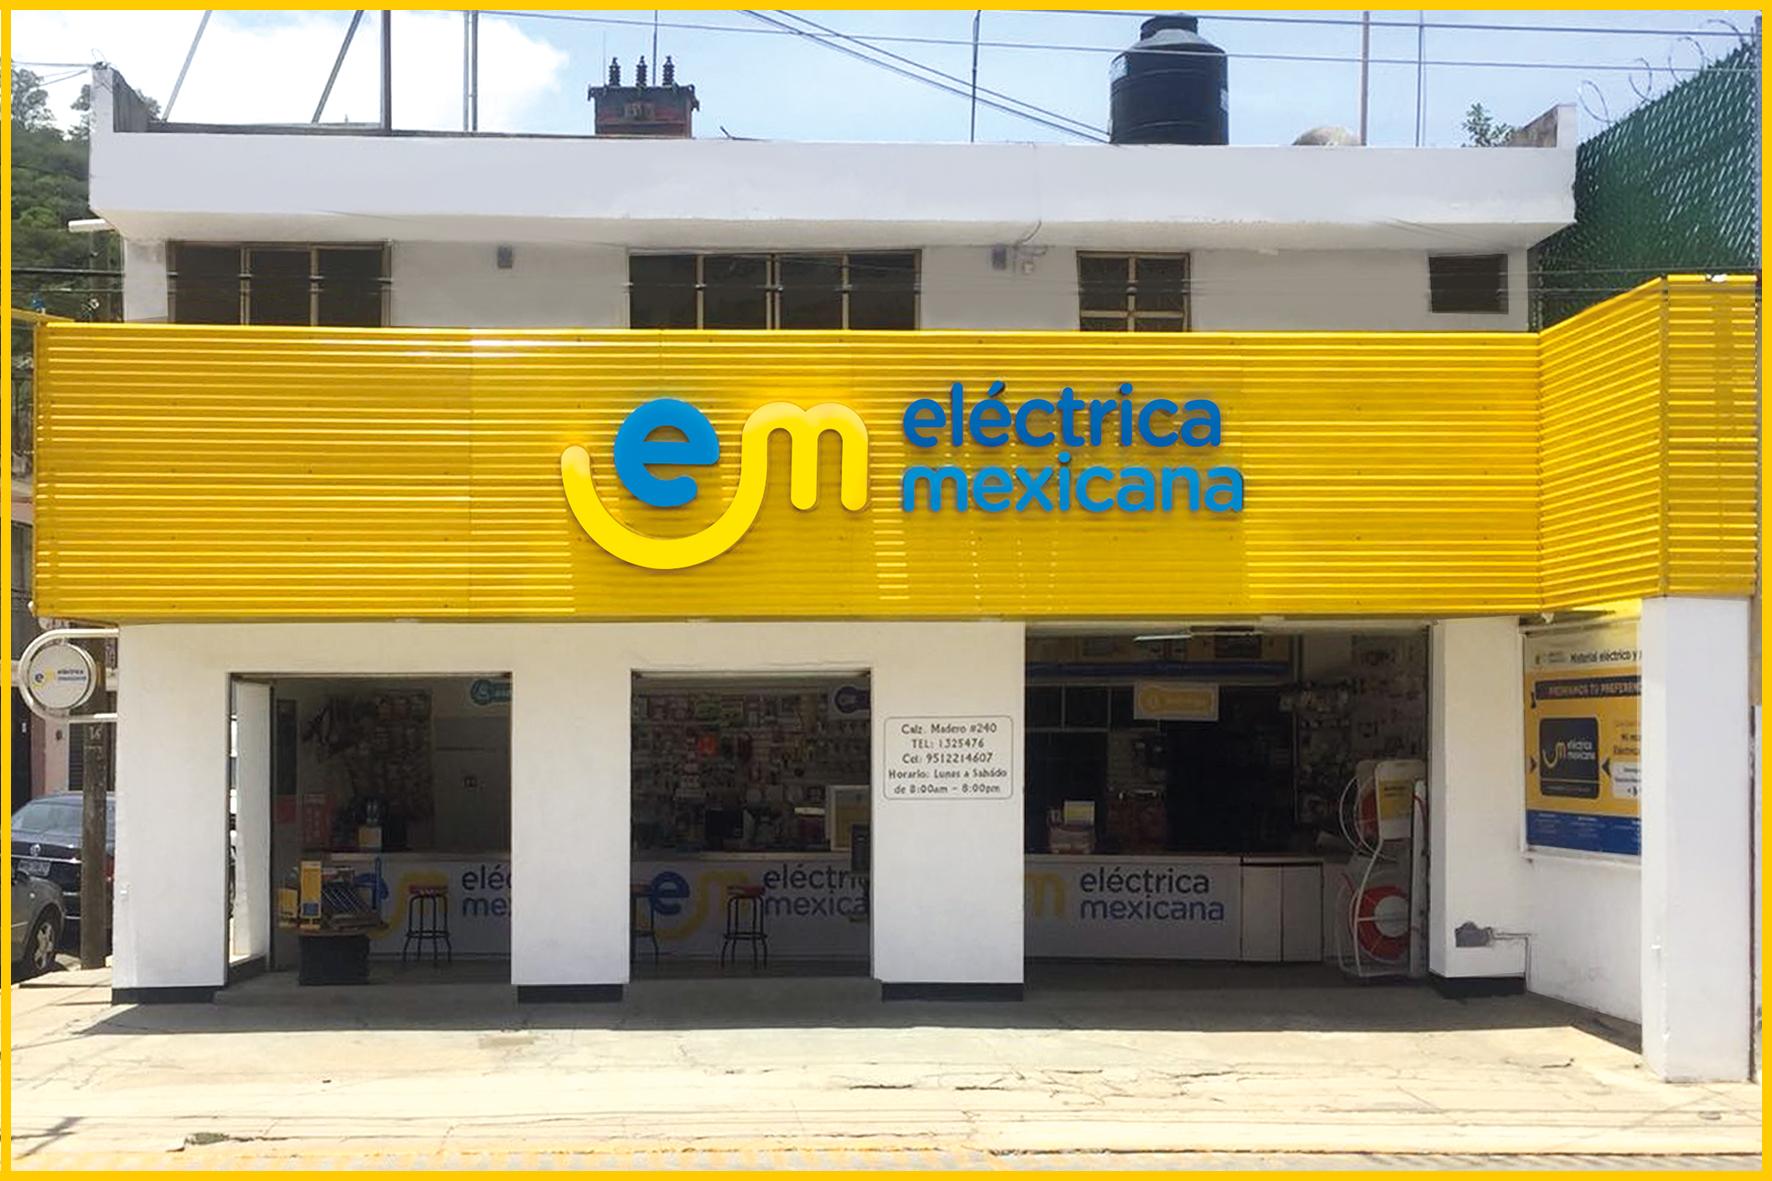 sucursal madero eléctrica mexicana